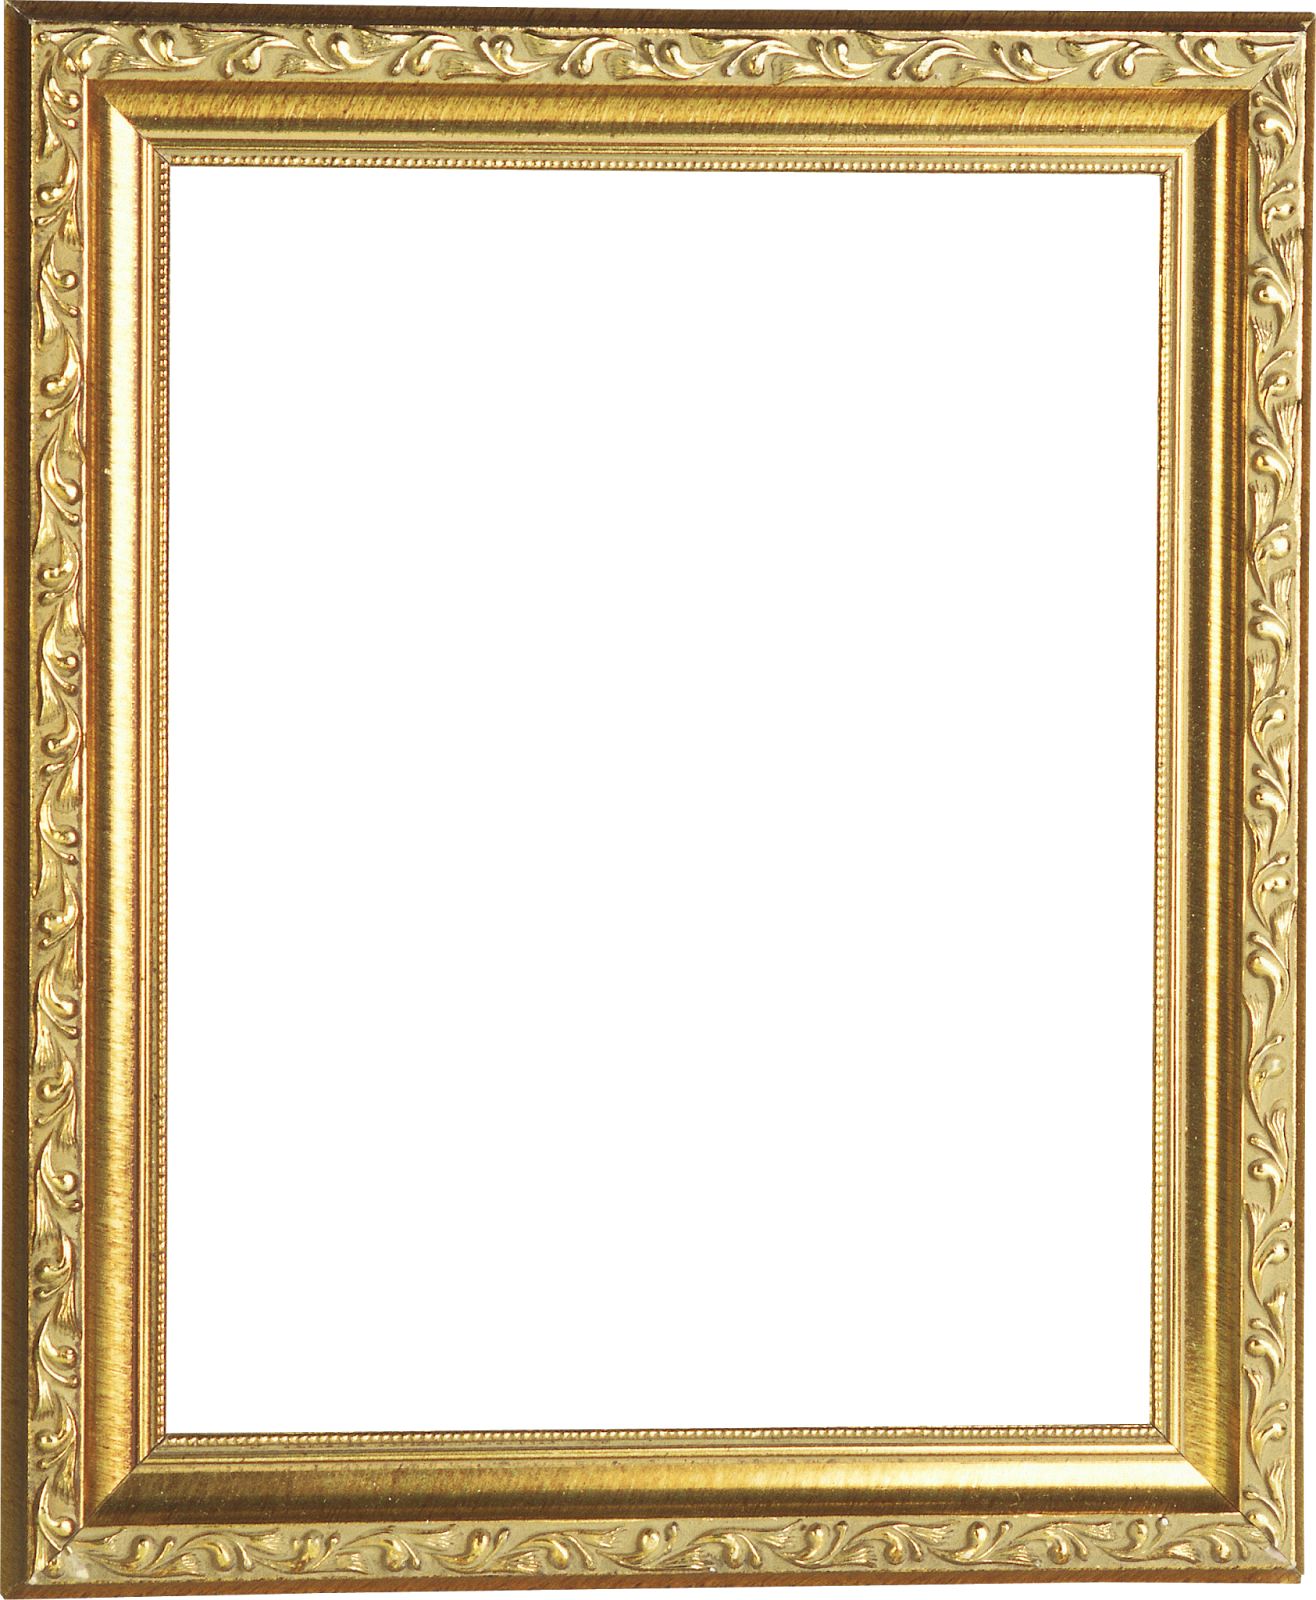 Gifs y fondos paz enla tormenta marcos dorados para fotos - Marco para cuadro ...